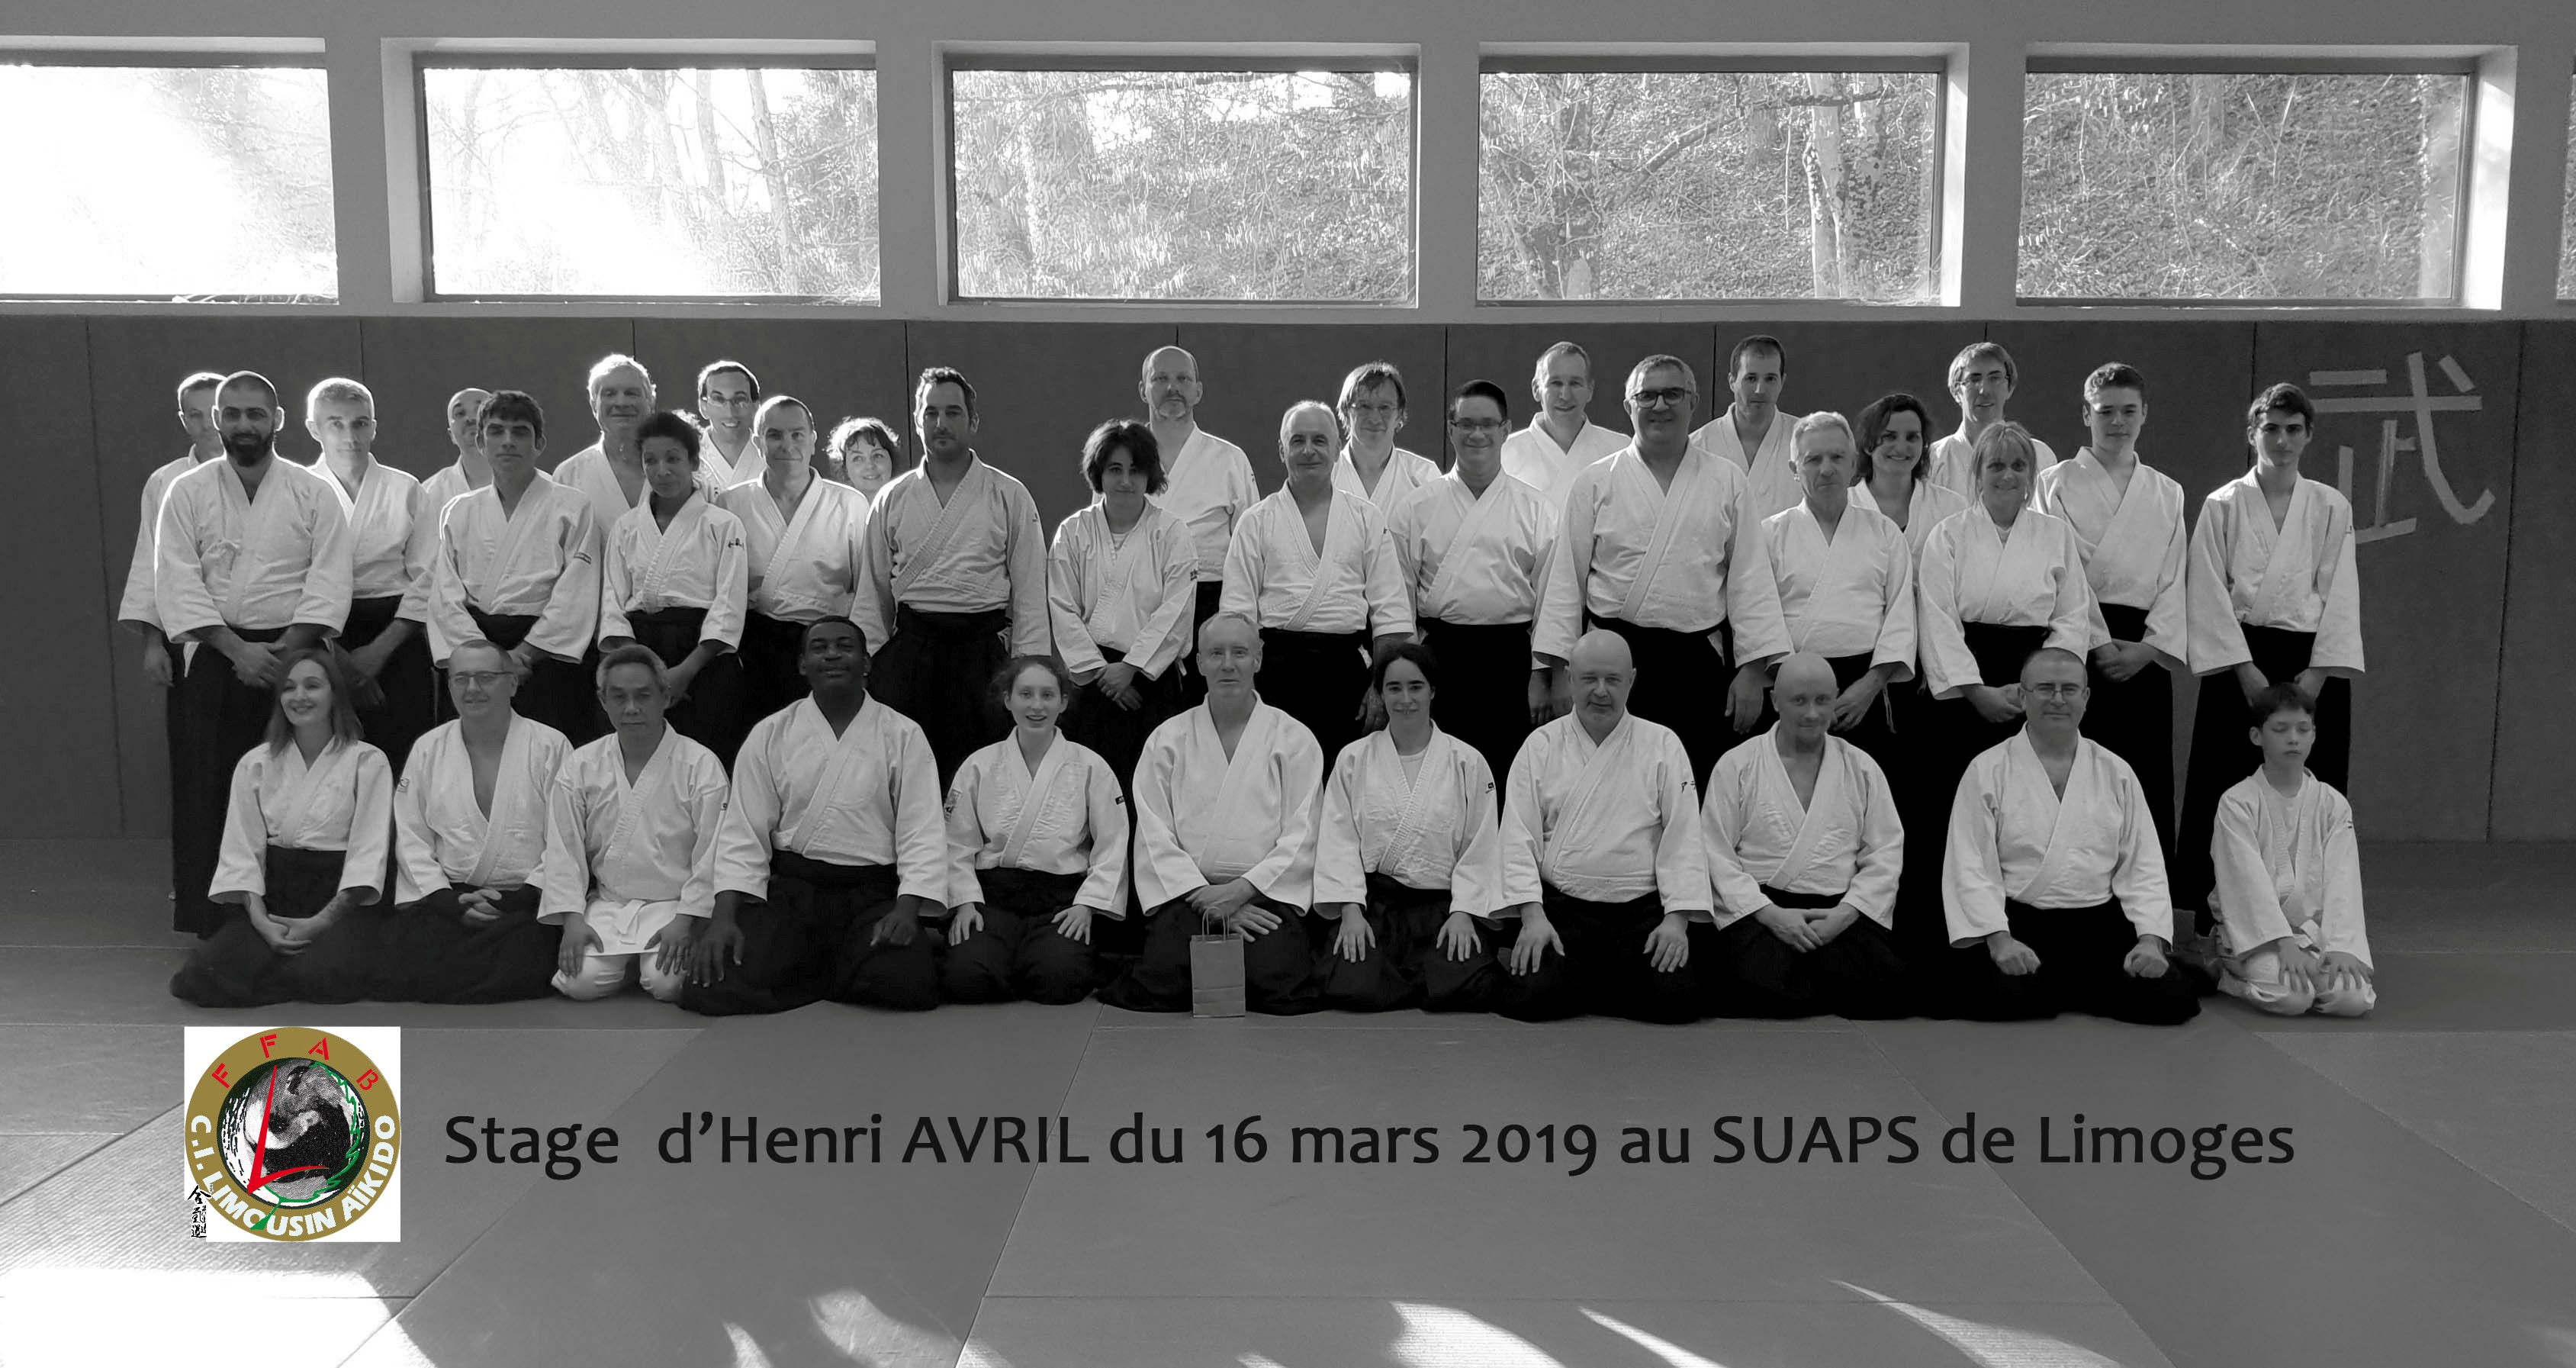 190316 photo 1 groupe Stage Henri Avril.jpg - 754,95 kB